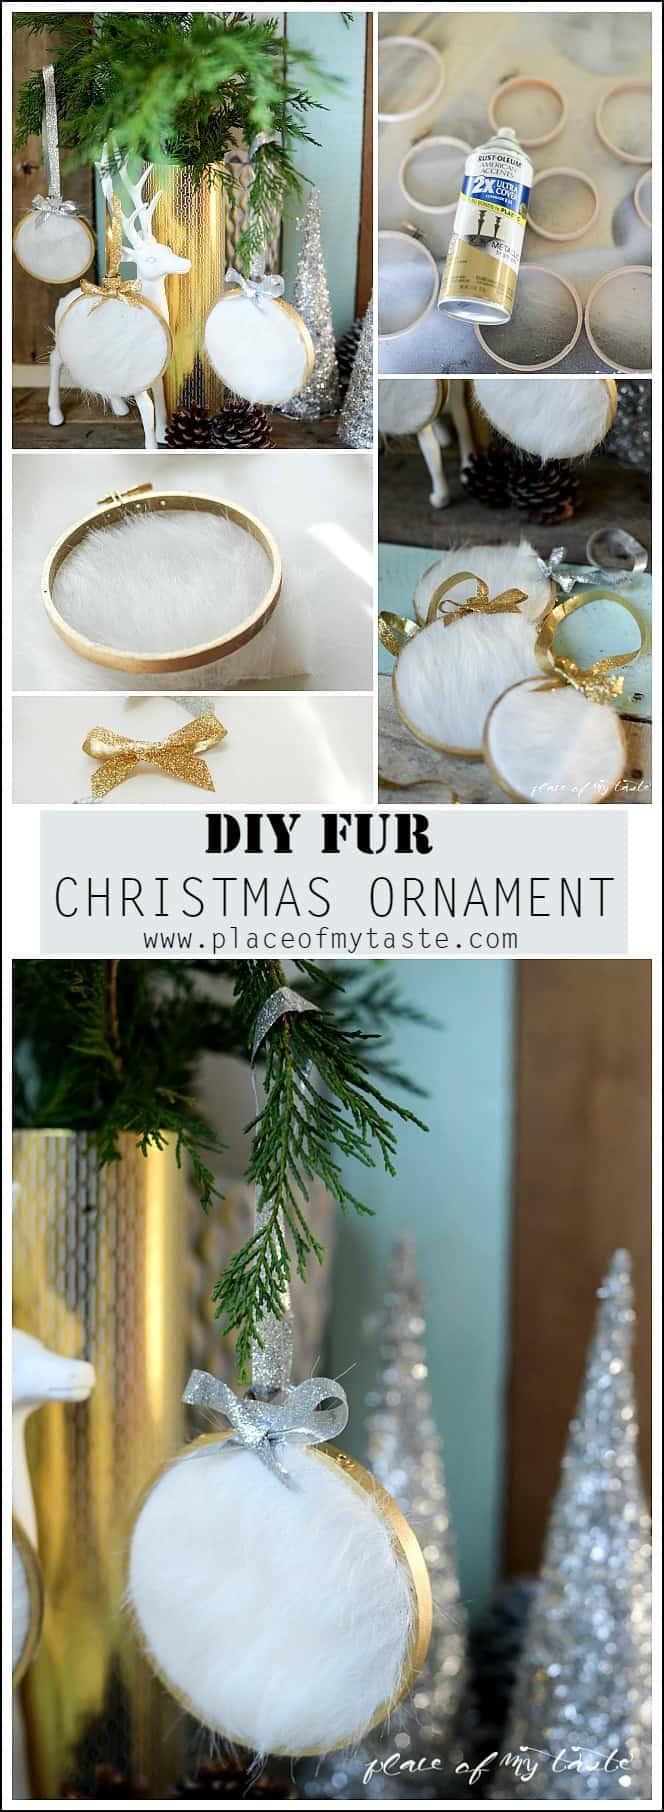 DIY Fur Christmas Ornament.